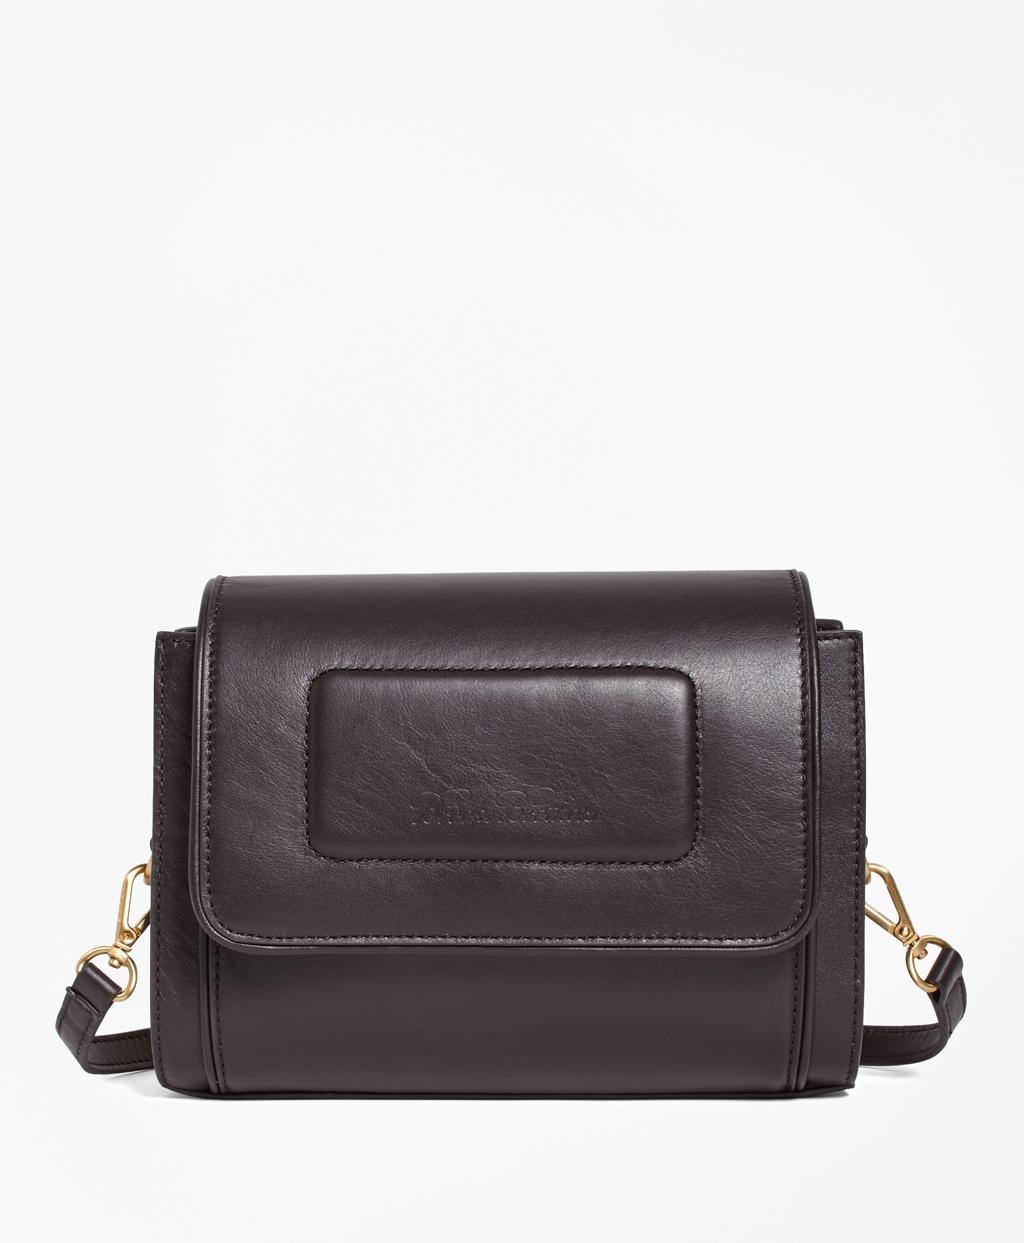 Women's Handbag Sale   Brooks Brothers